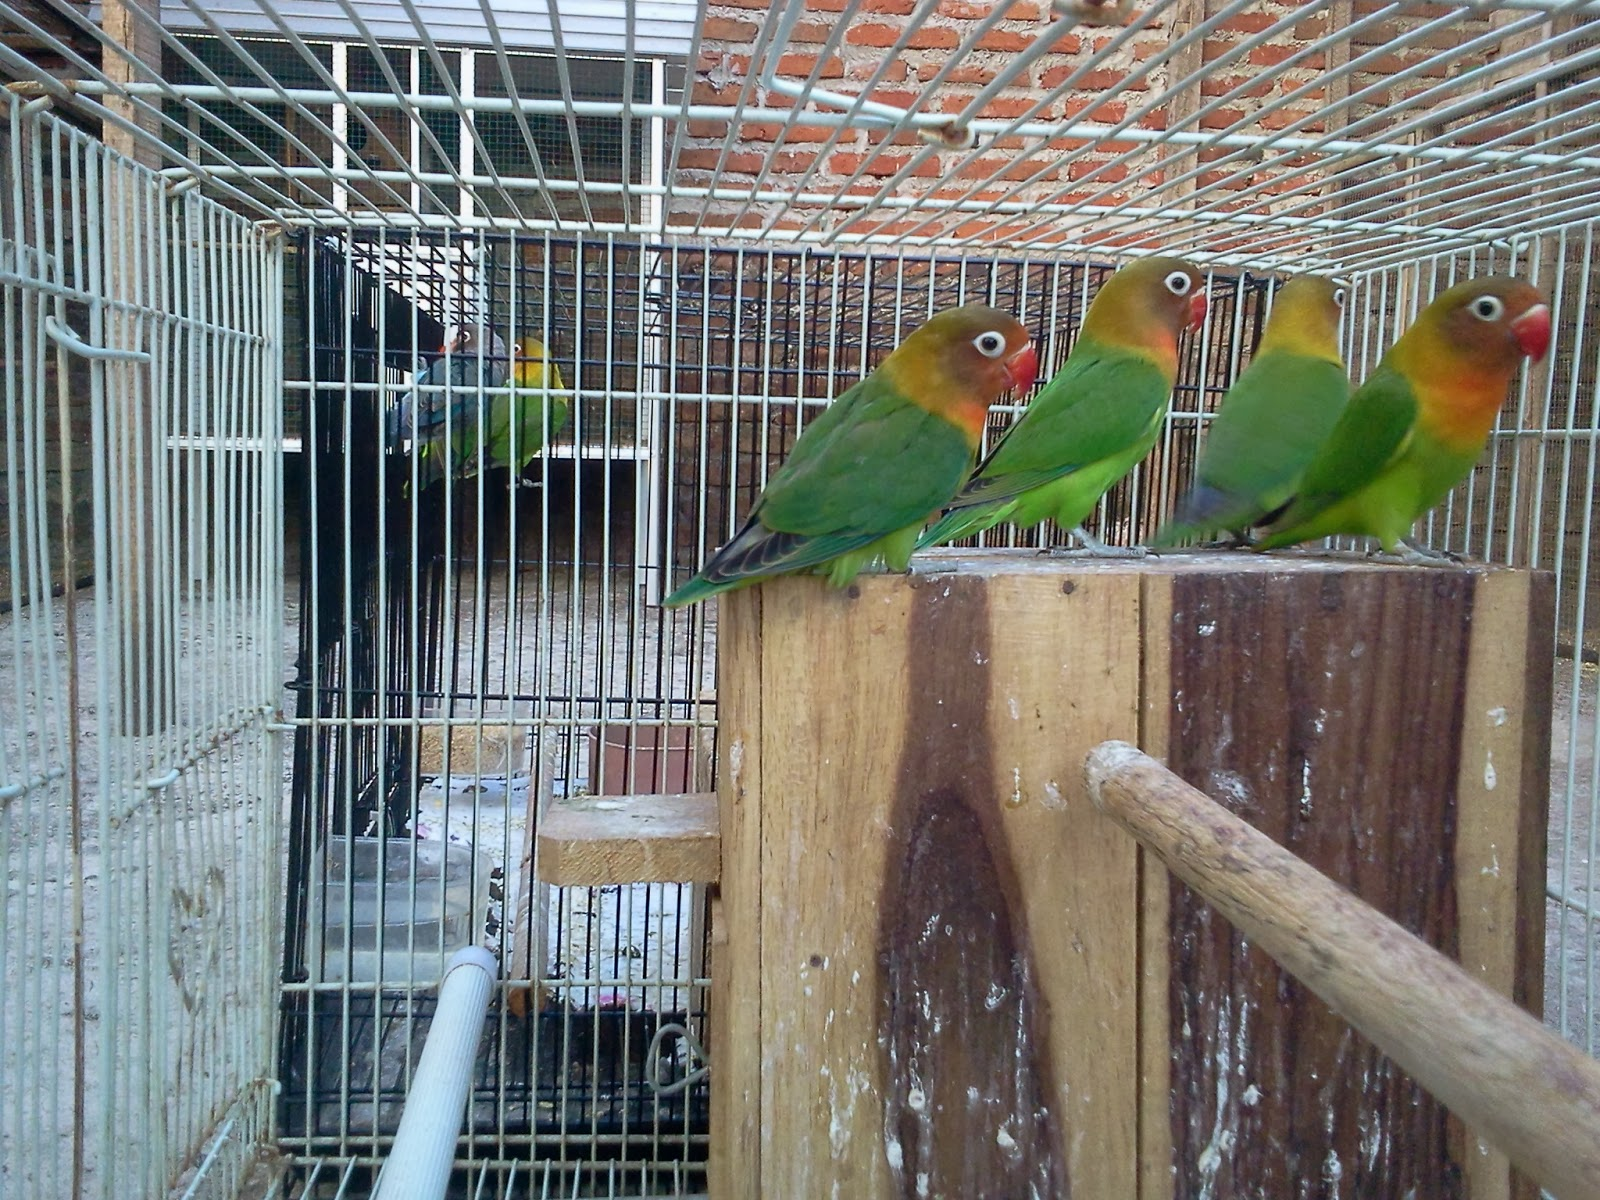 JUAL LOVE BIRD | HARGA LOVE BIRD | BURUNG LOVE BIRD